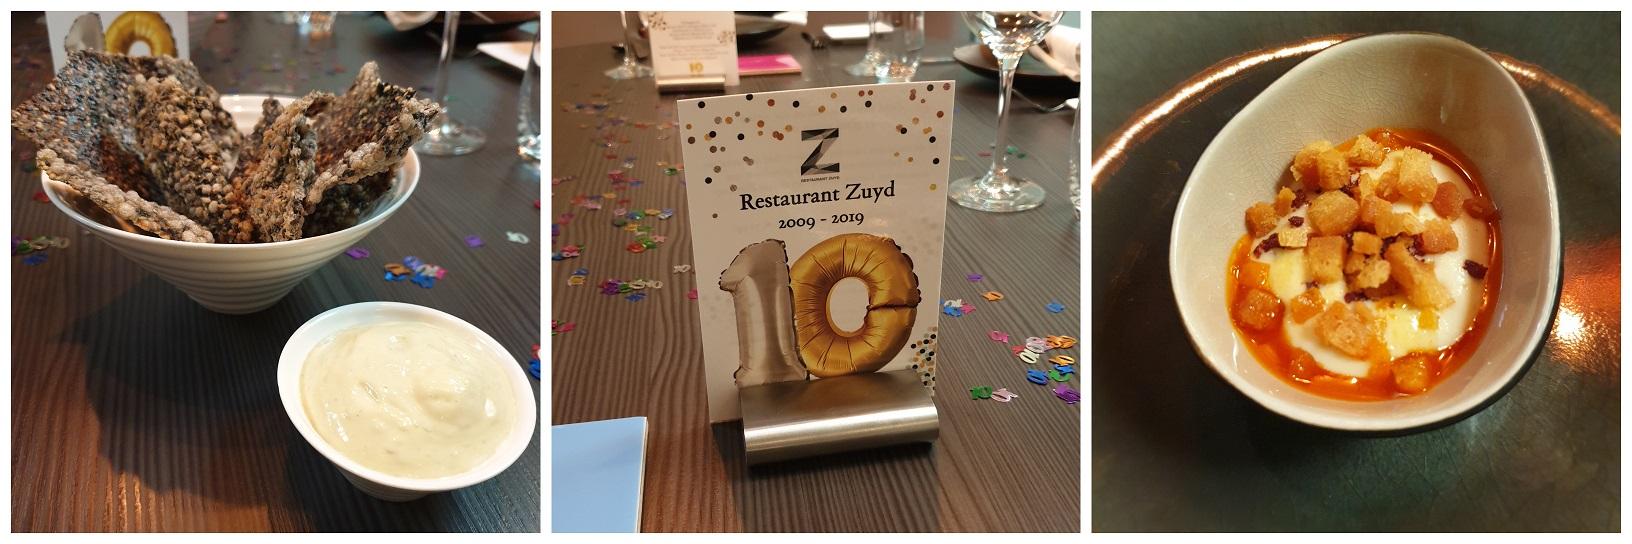 Restaurant Zuyd Amuses